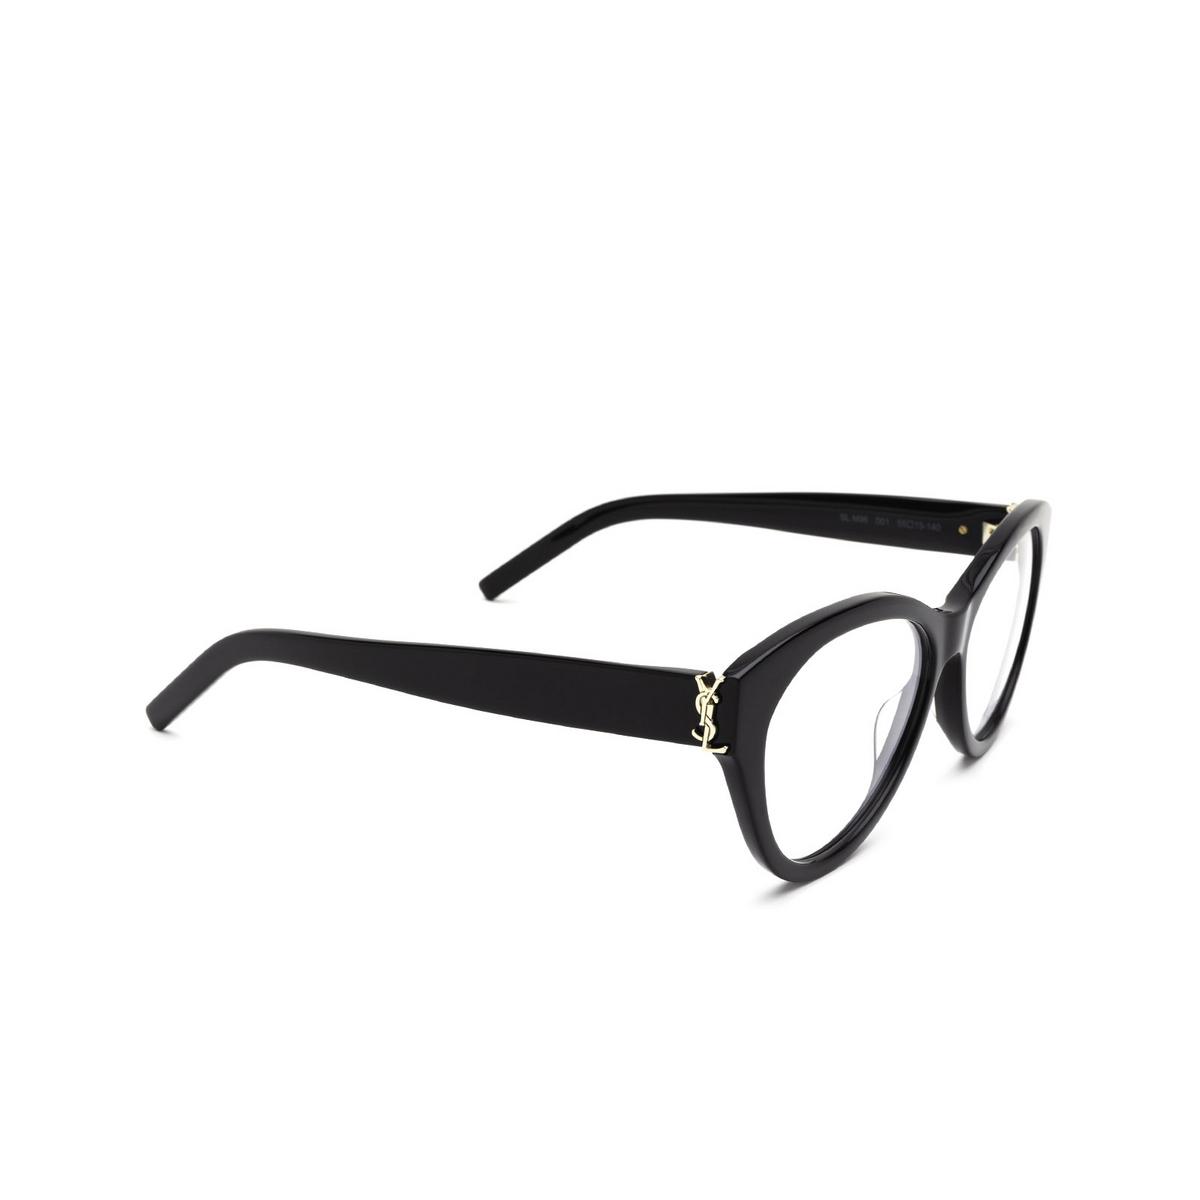 Saint Laurent® Cat-eye Eyeglasses: SL M96 color Black 001 - three-quarters view.